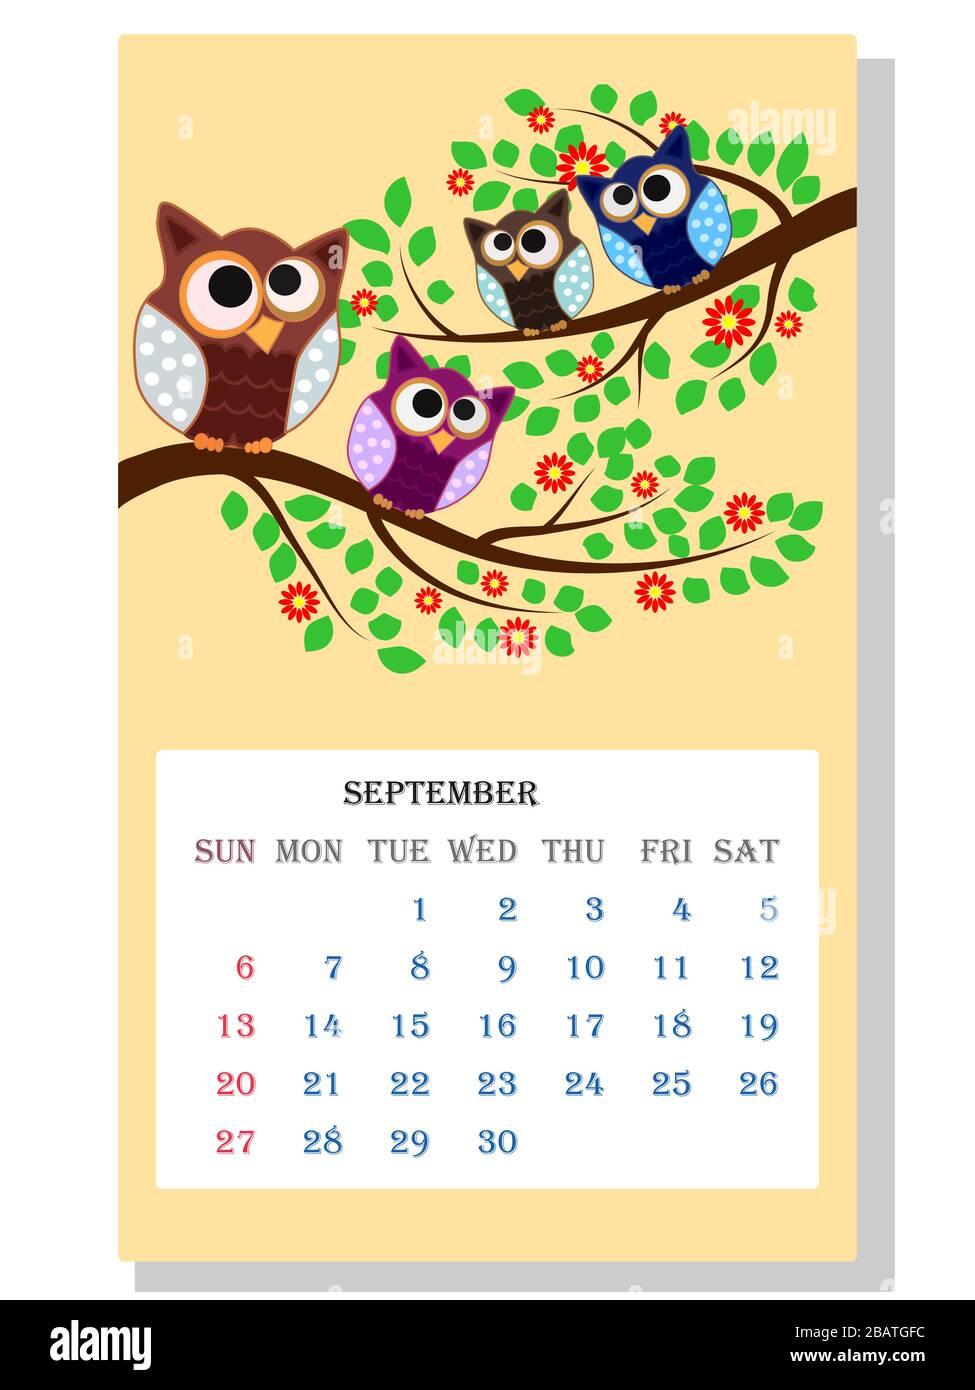 Owls Season Vector Wallpaper Wallpaper High Resolution Stock